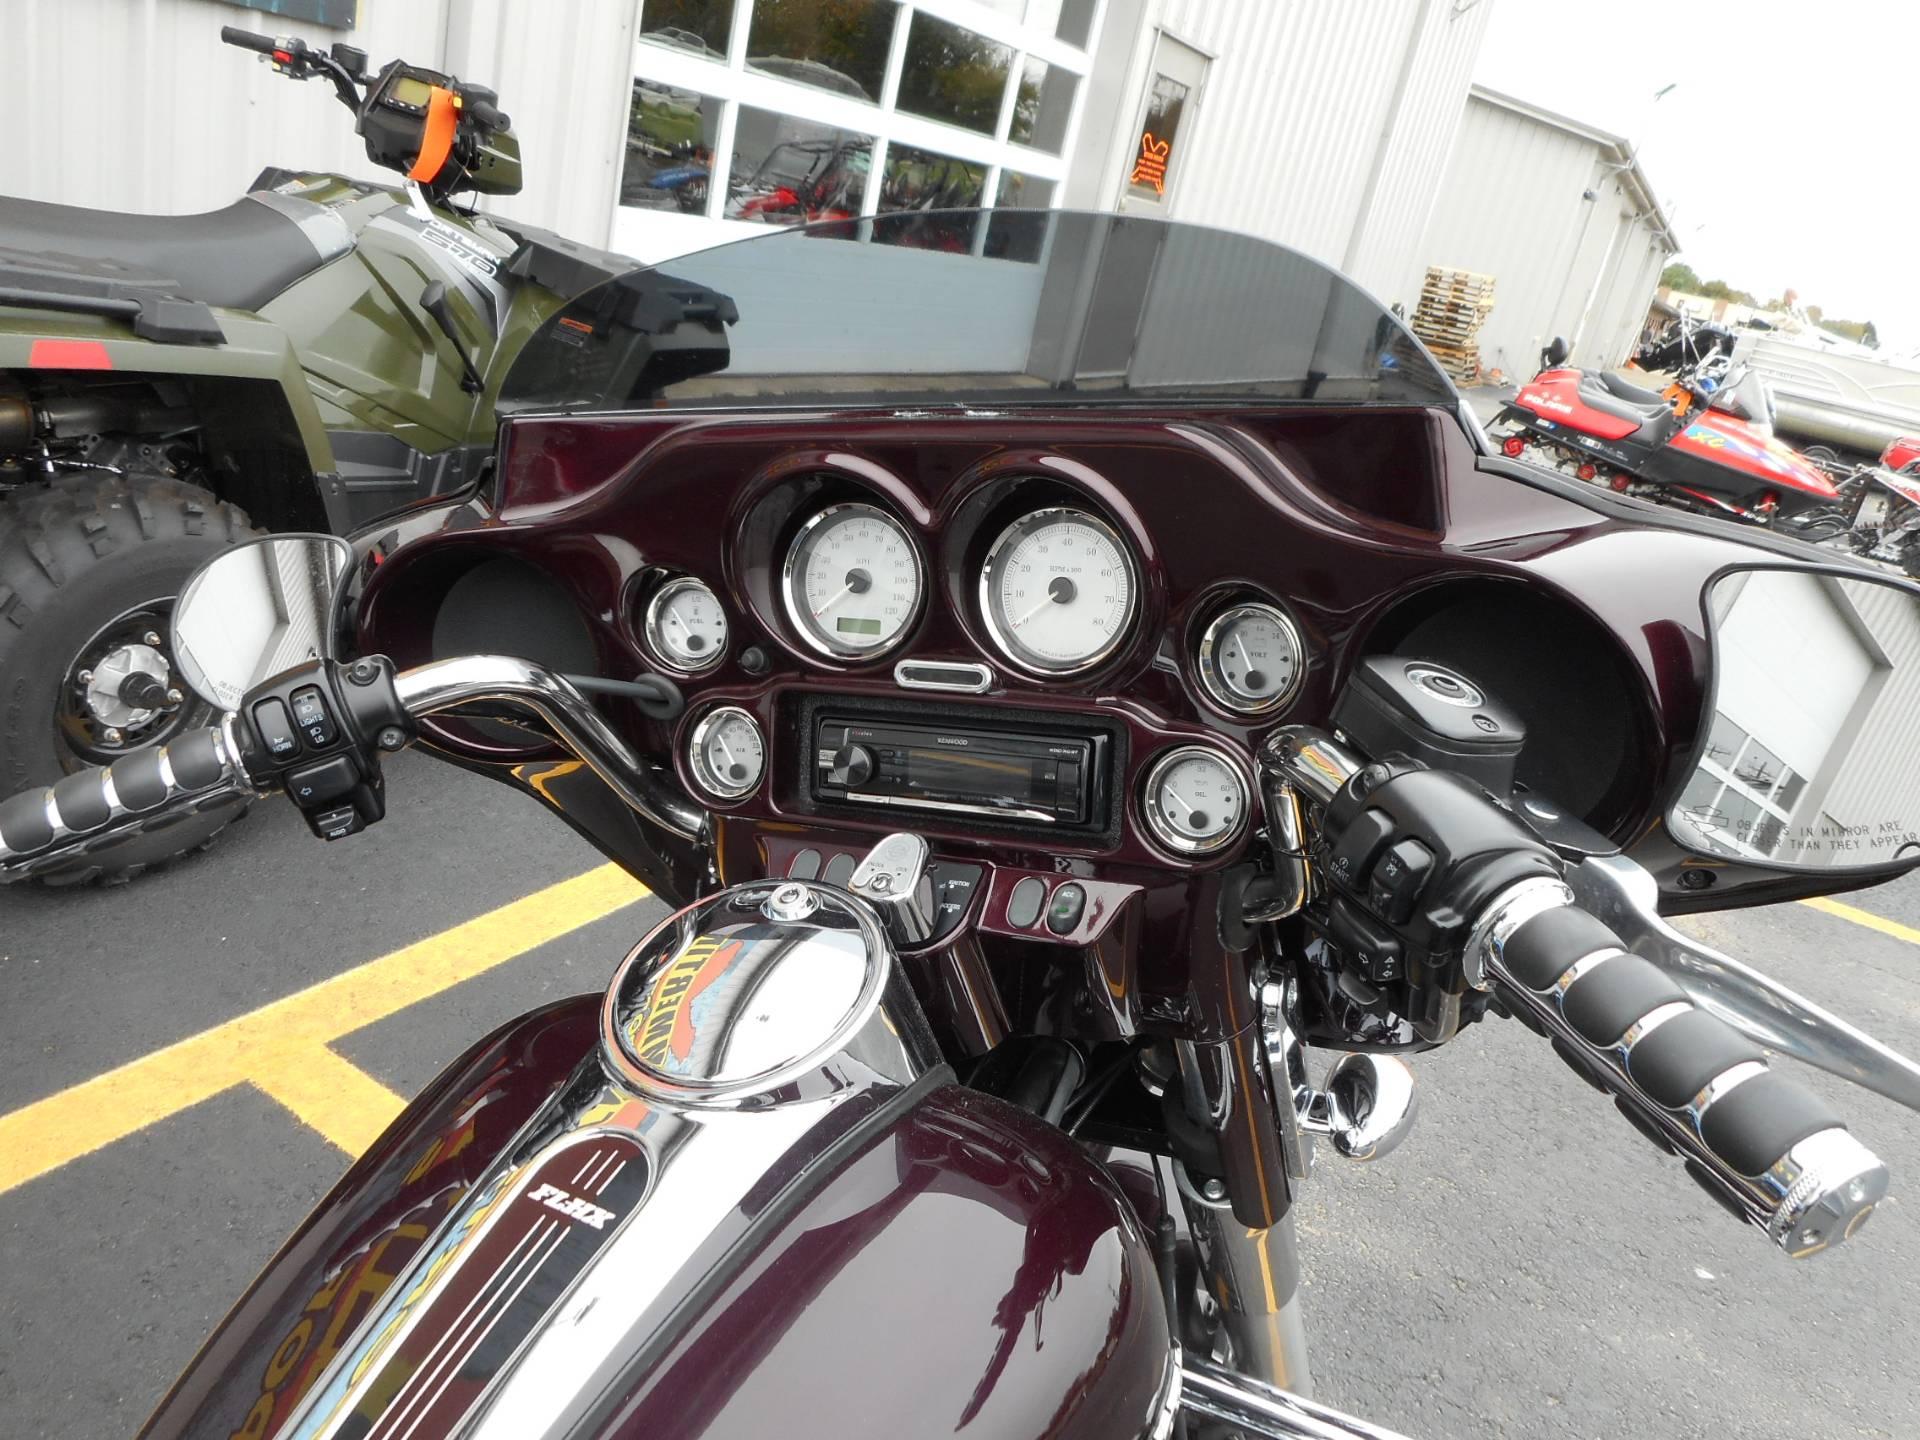 2007 Harley-Davidson FLHX Street Glide 9